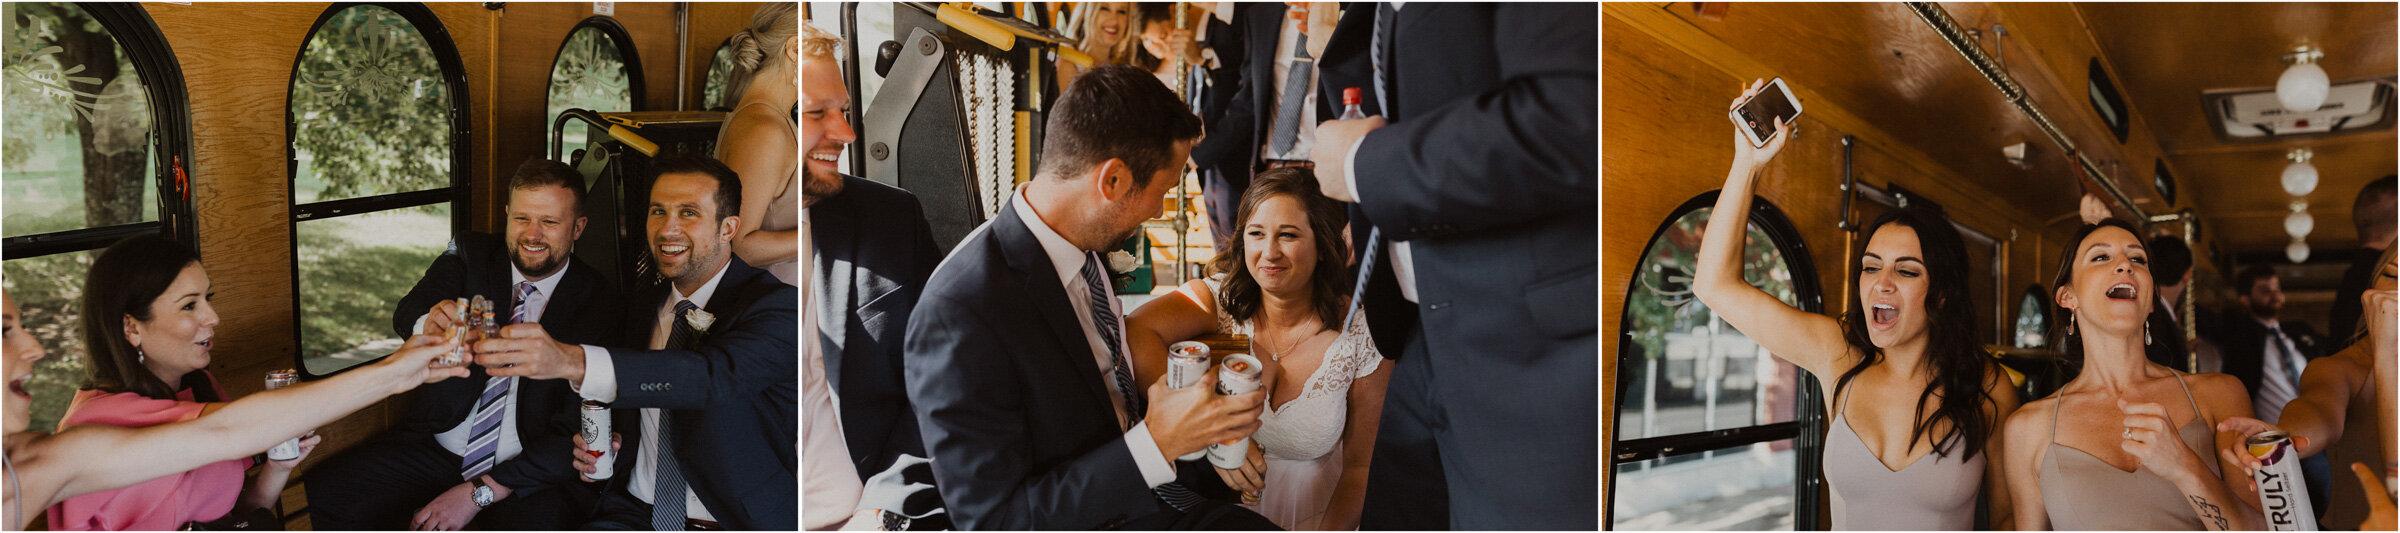 alyssa barletter photography the abbott kansas city summer wedding-29.jpg